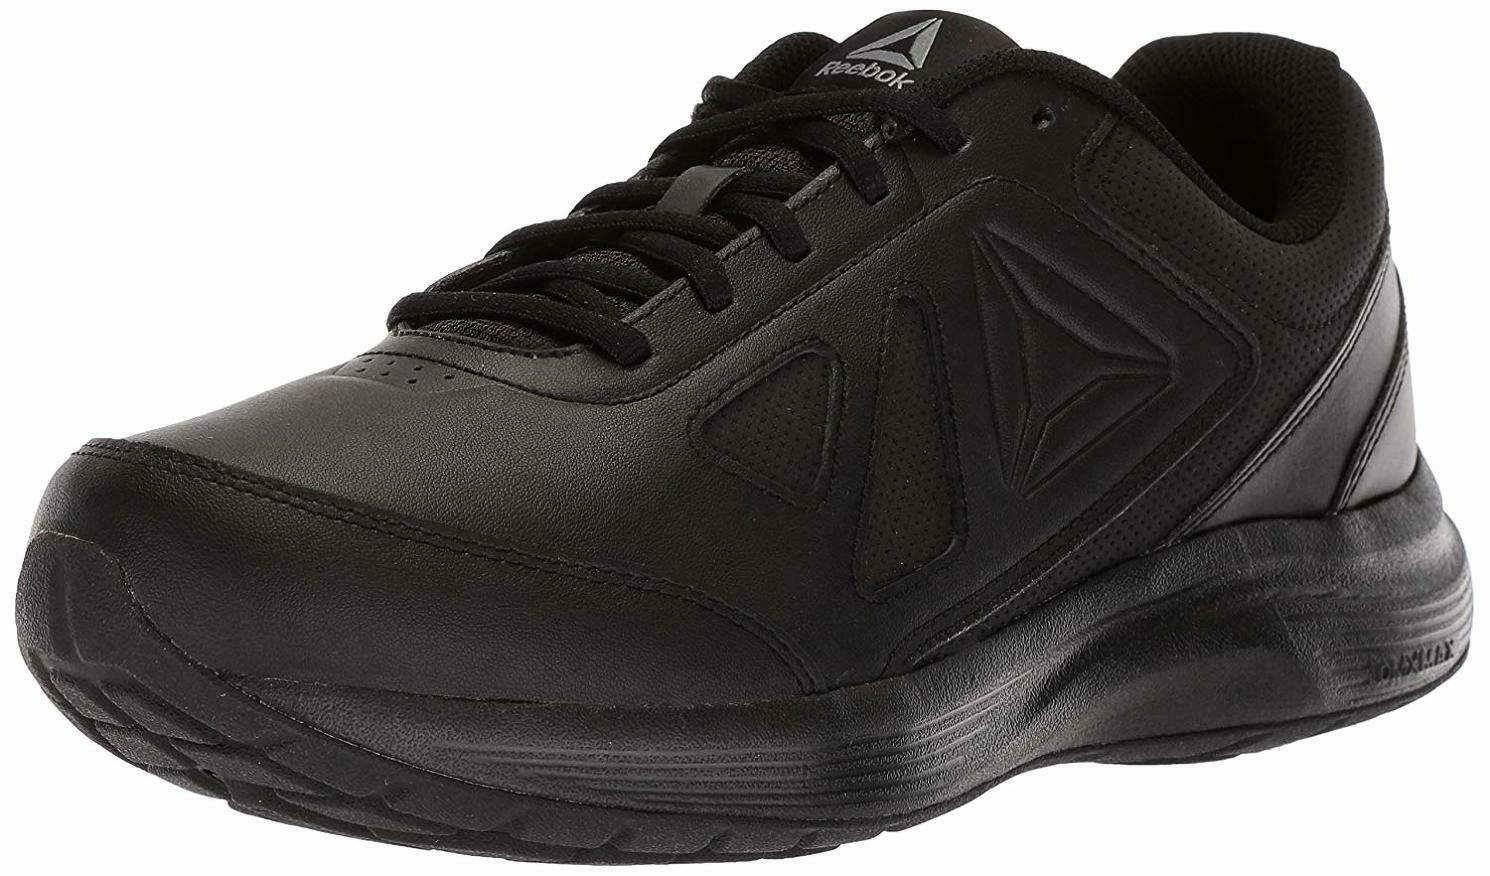 Reebok Men's Walk Ultra 6 DMX Max Sneaker - Choose SZ color